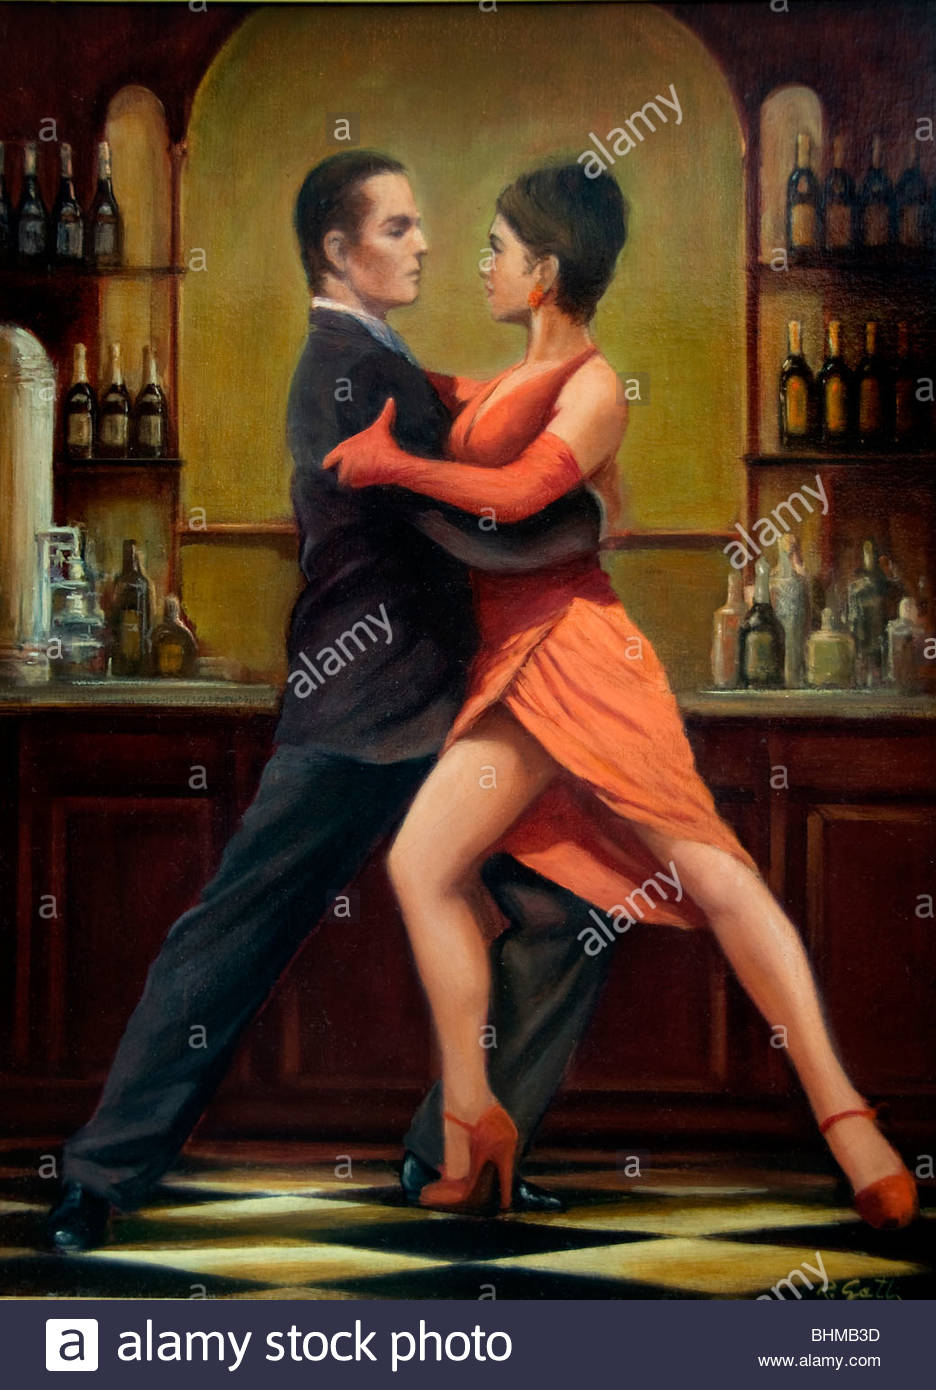 Tango Buenos Aires Argentine La Boca El Caminito Signer Street Painting Photo Stock